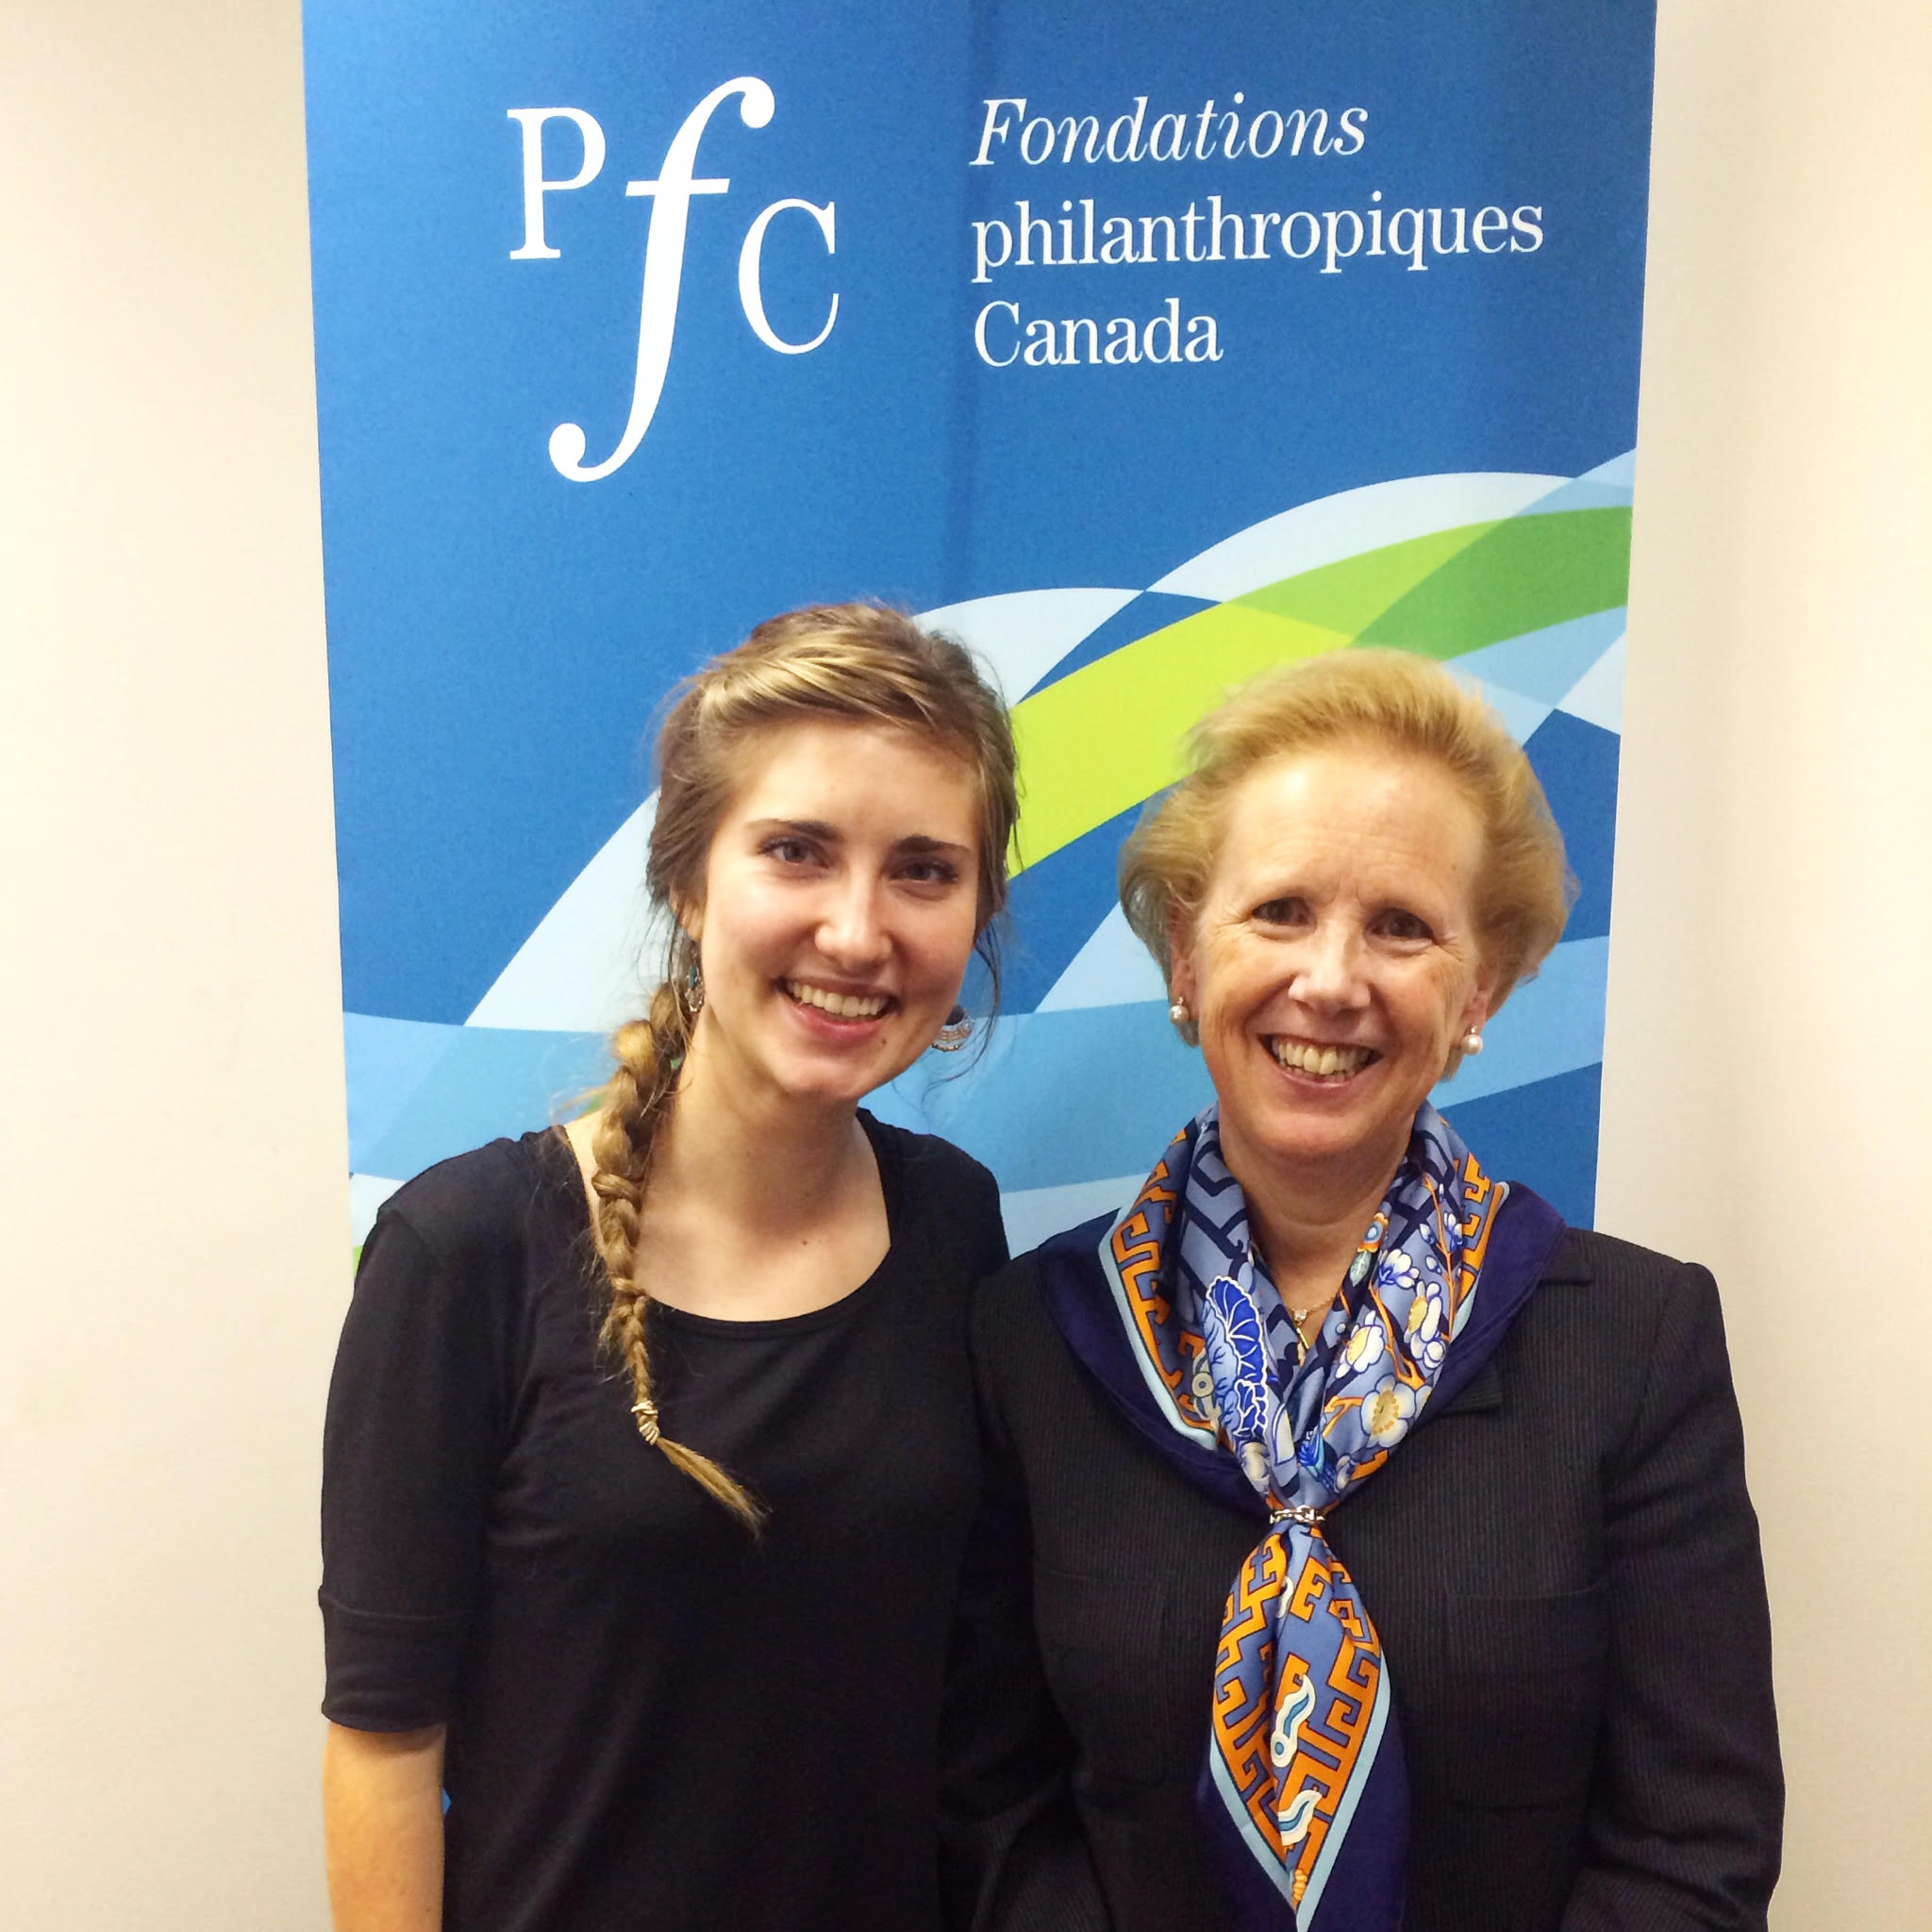 Christina Klassen and Hilary Pearson